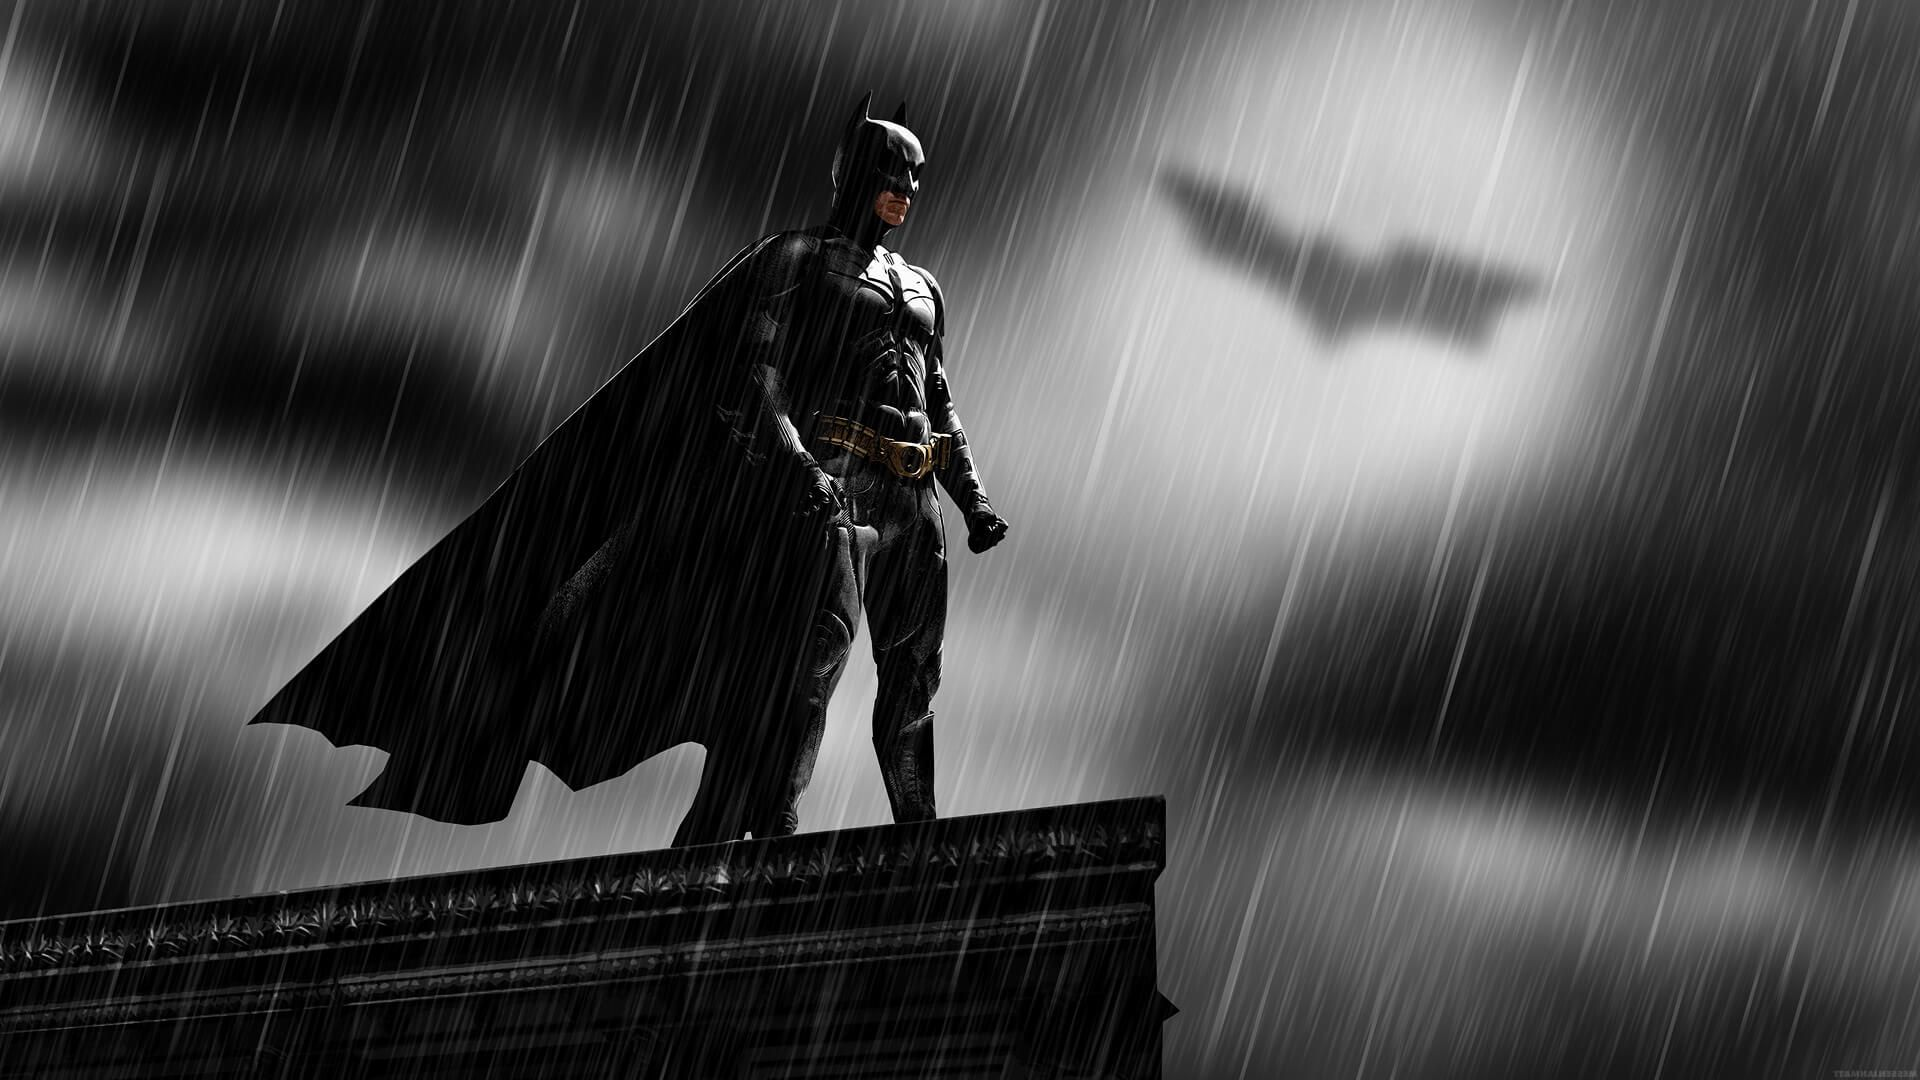 Batman HD Wallpapers Backgrounds Wallpaper 1680×1050